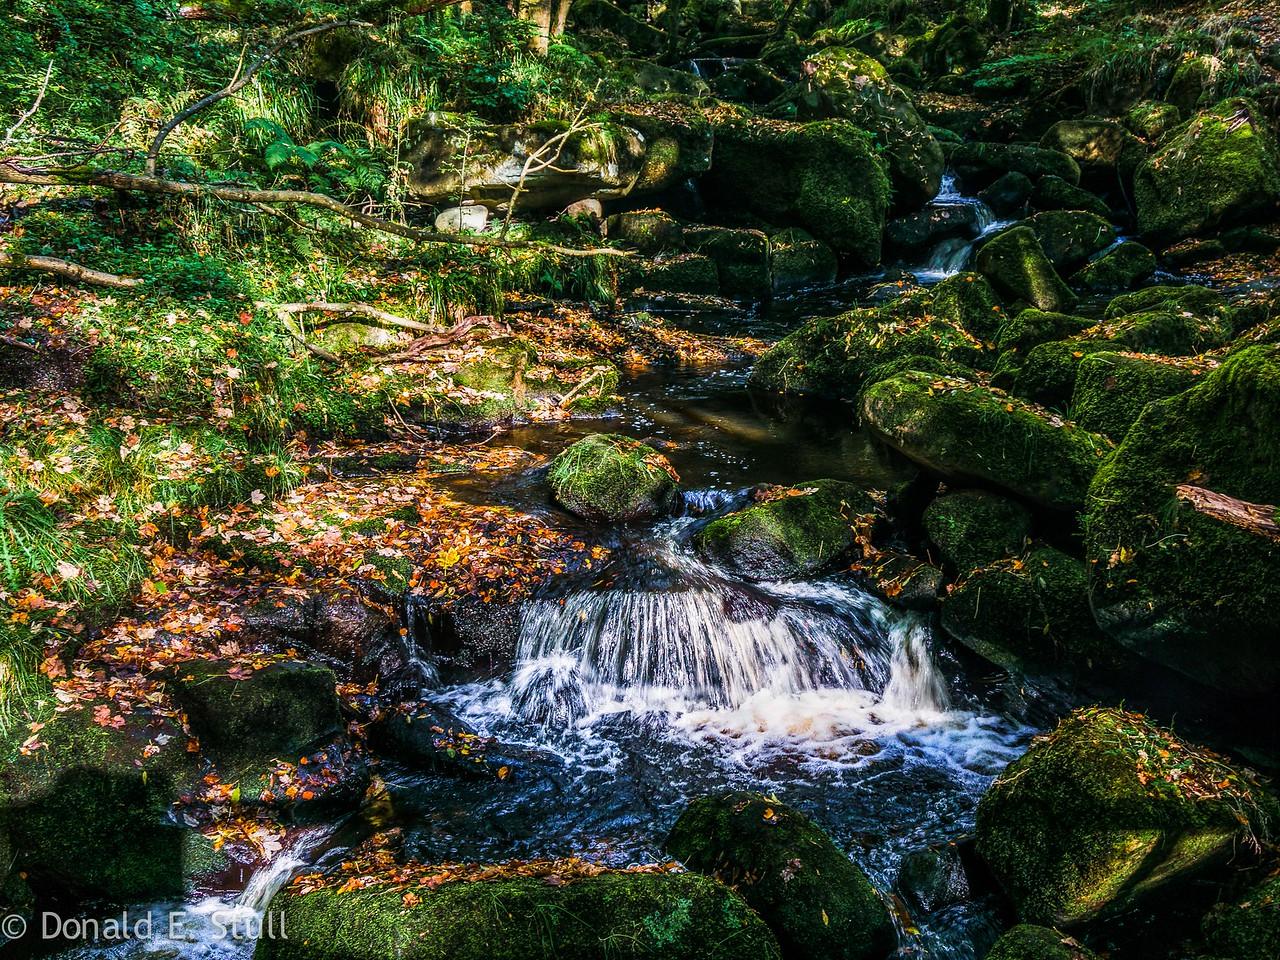 Burbage Brook, Grindleford, UK